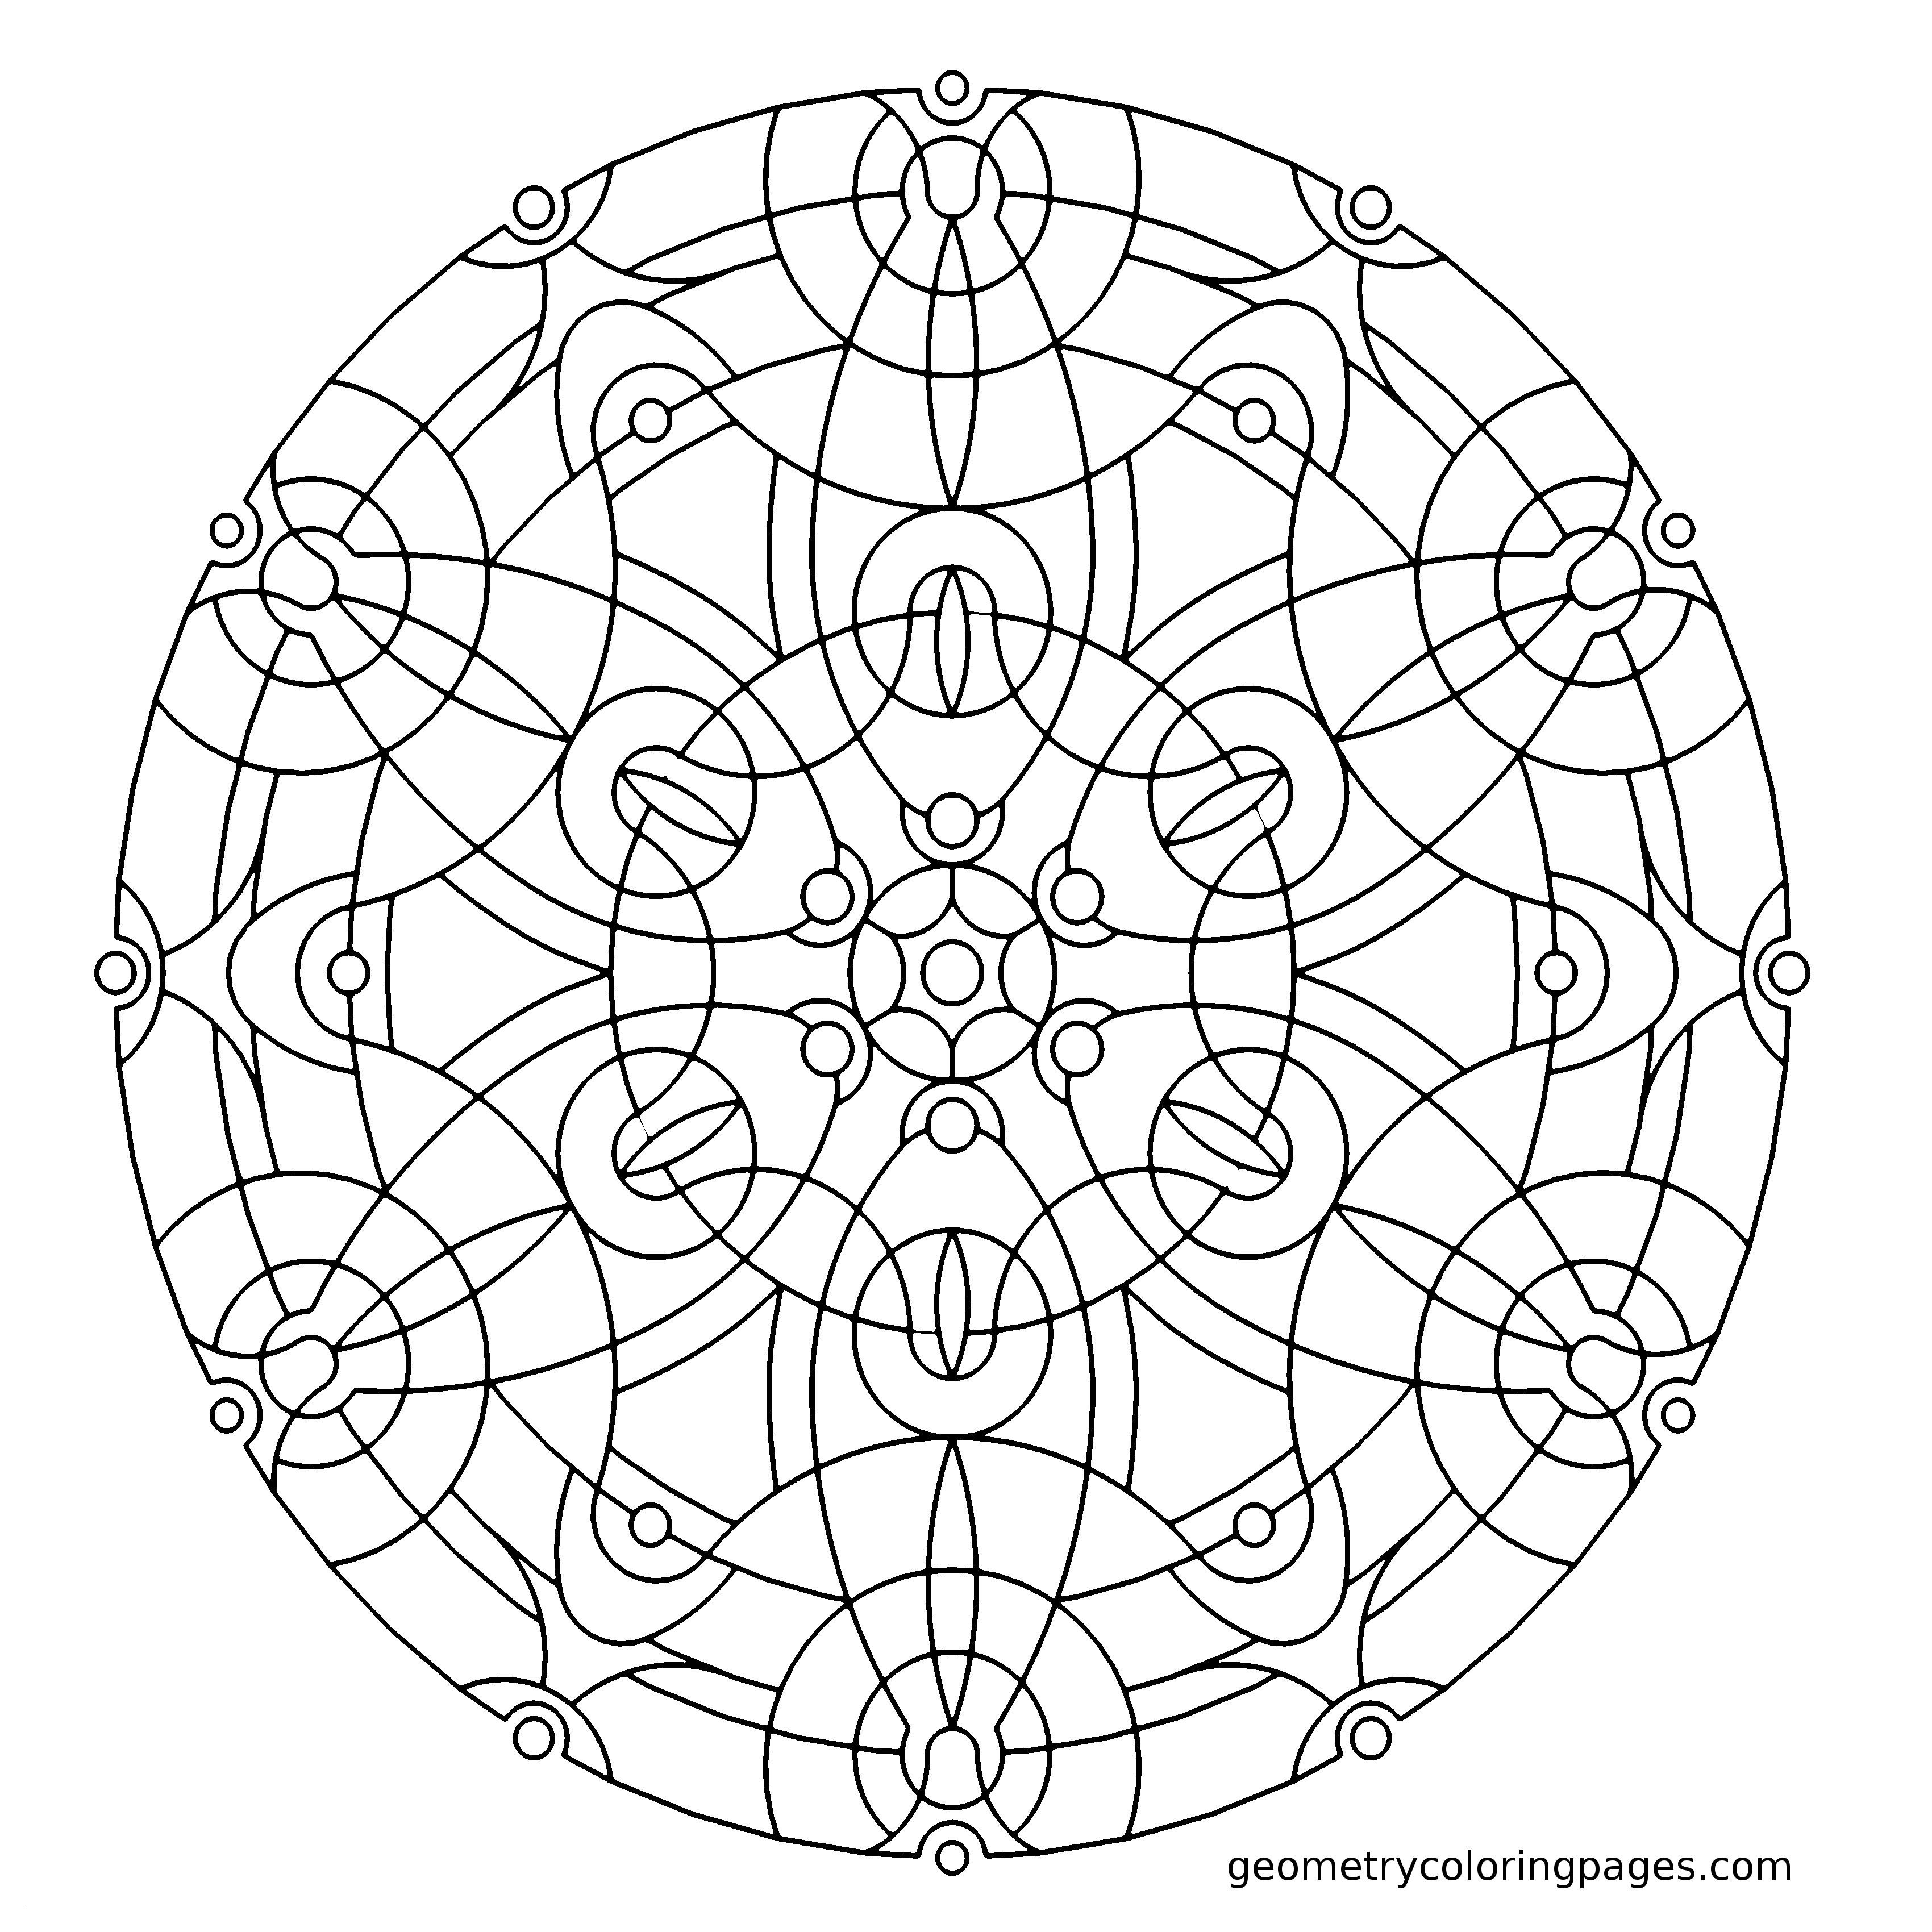 Soy Luna Ausmalbilder Neu Coloring Page Mystery Coloring Mandalas Schön Ausmalbilder Bild